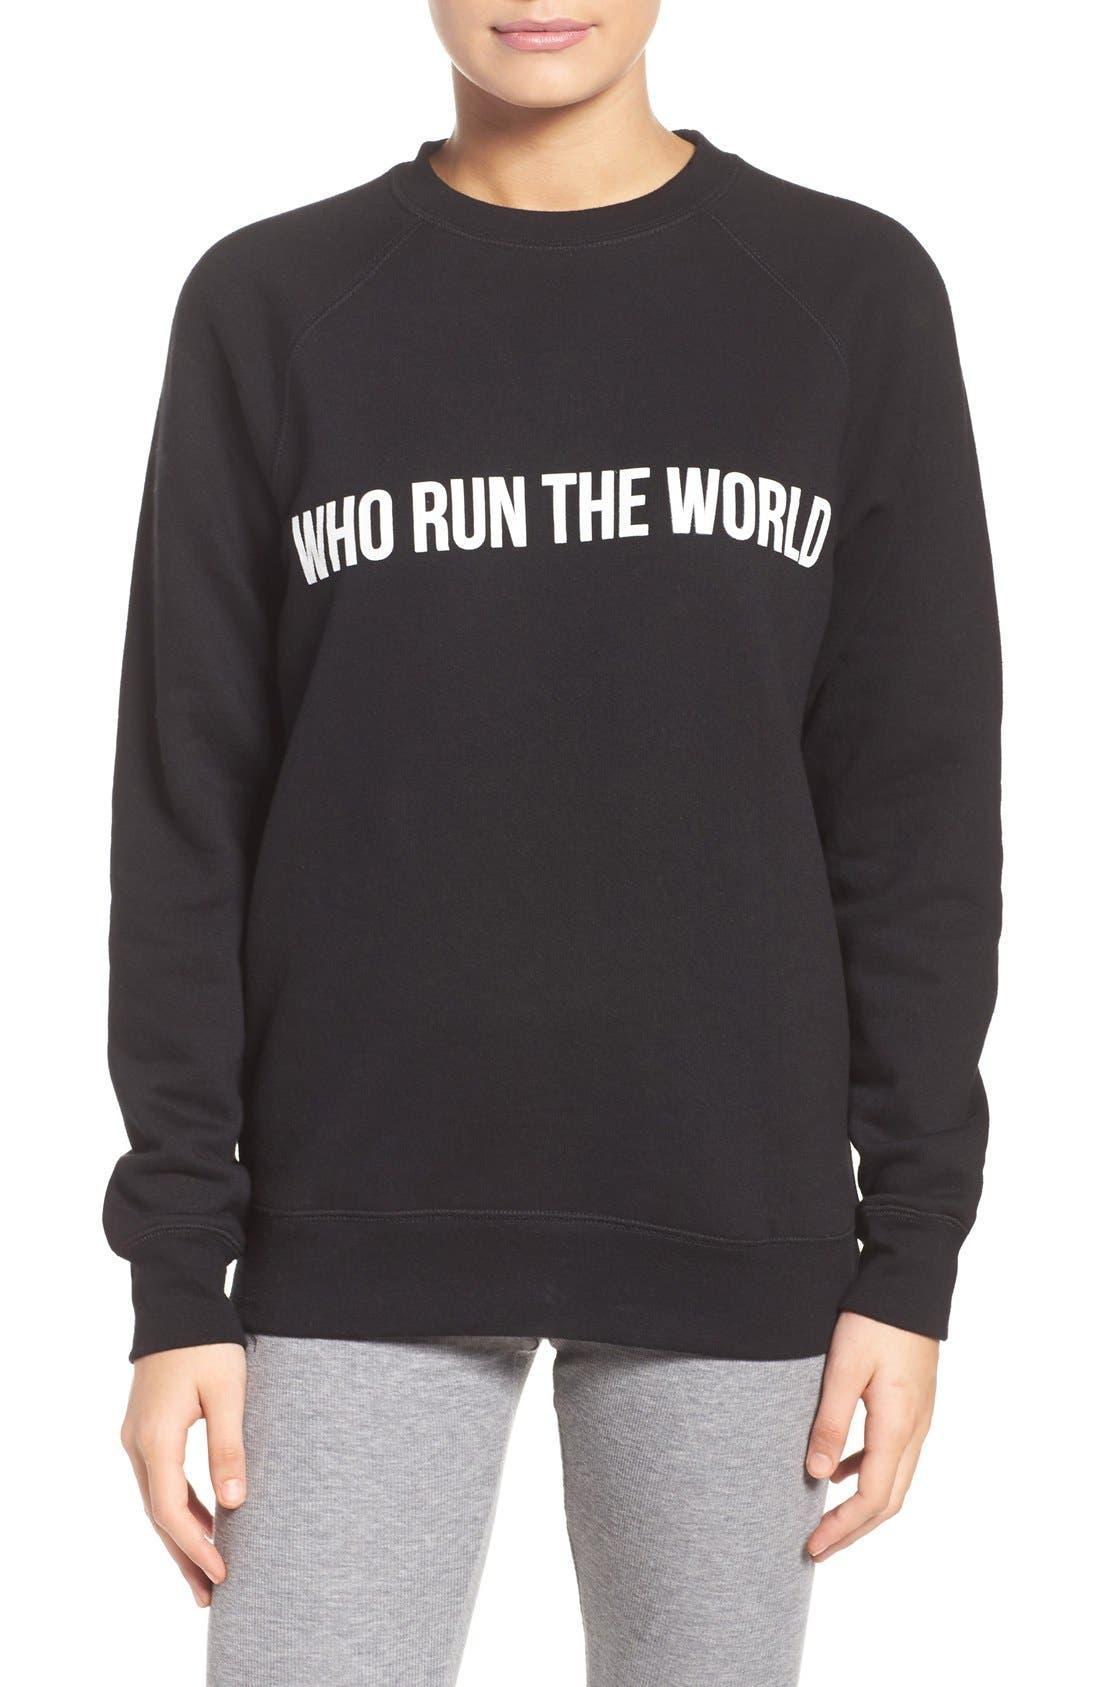 Who Run the World Sweatshirt,                         Main,                         color,